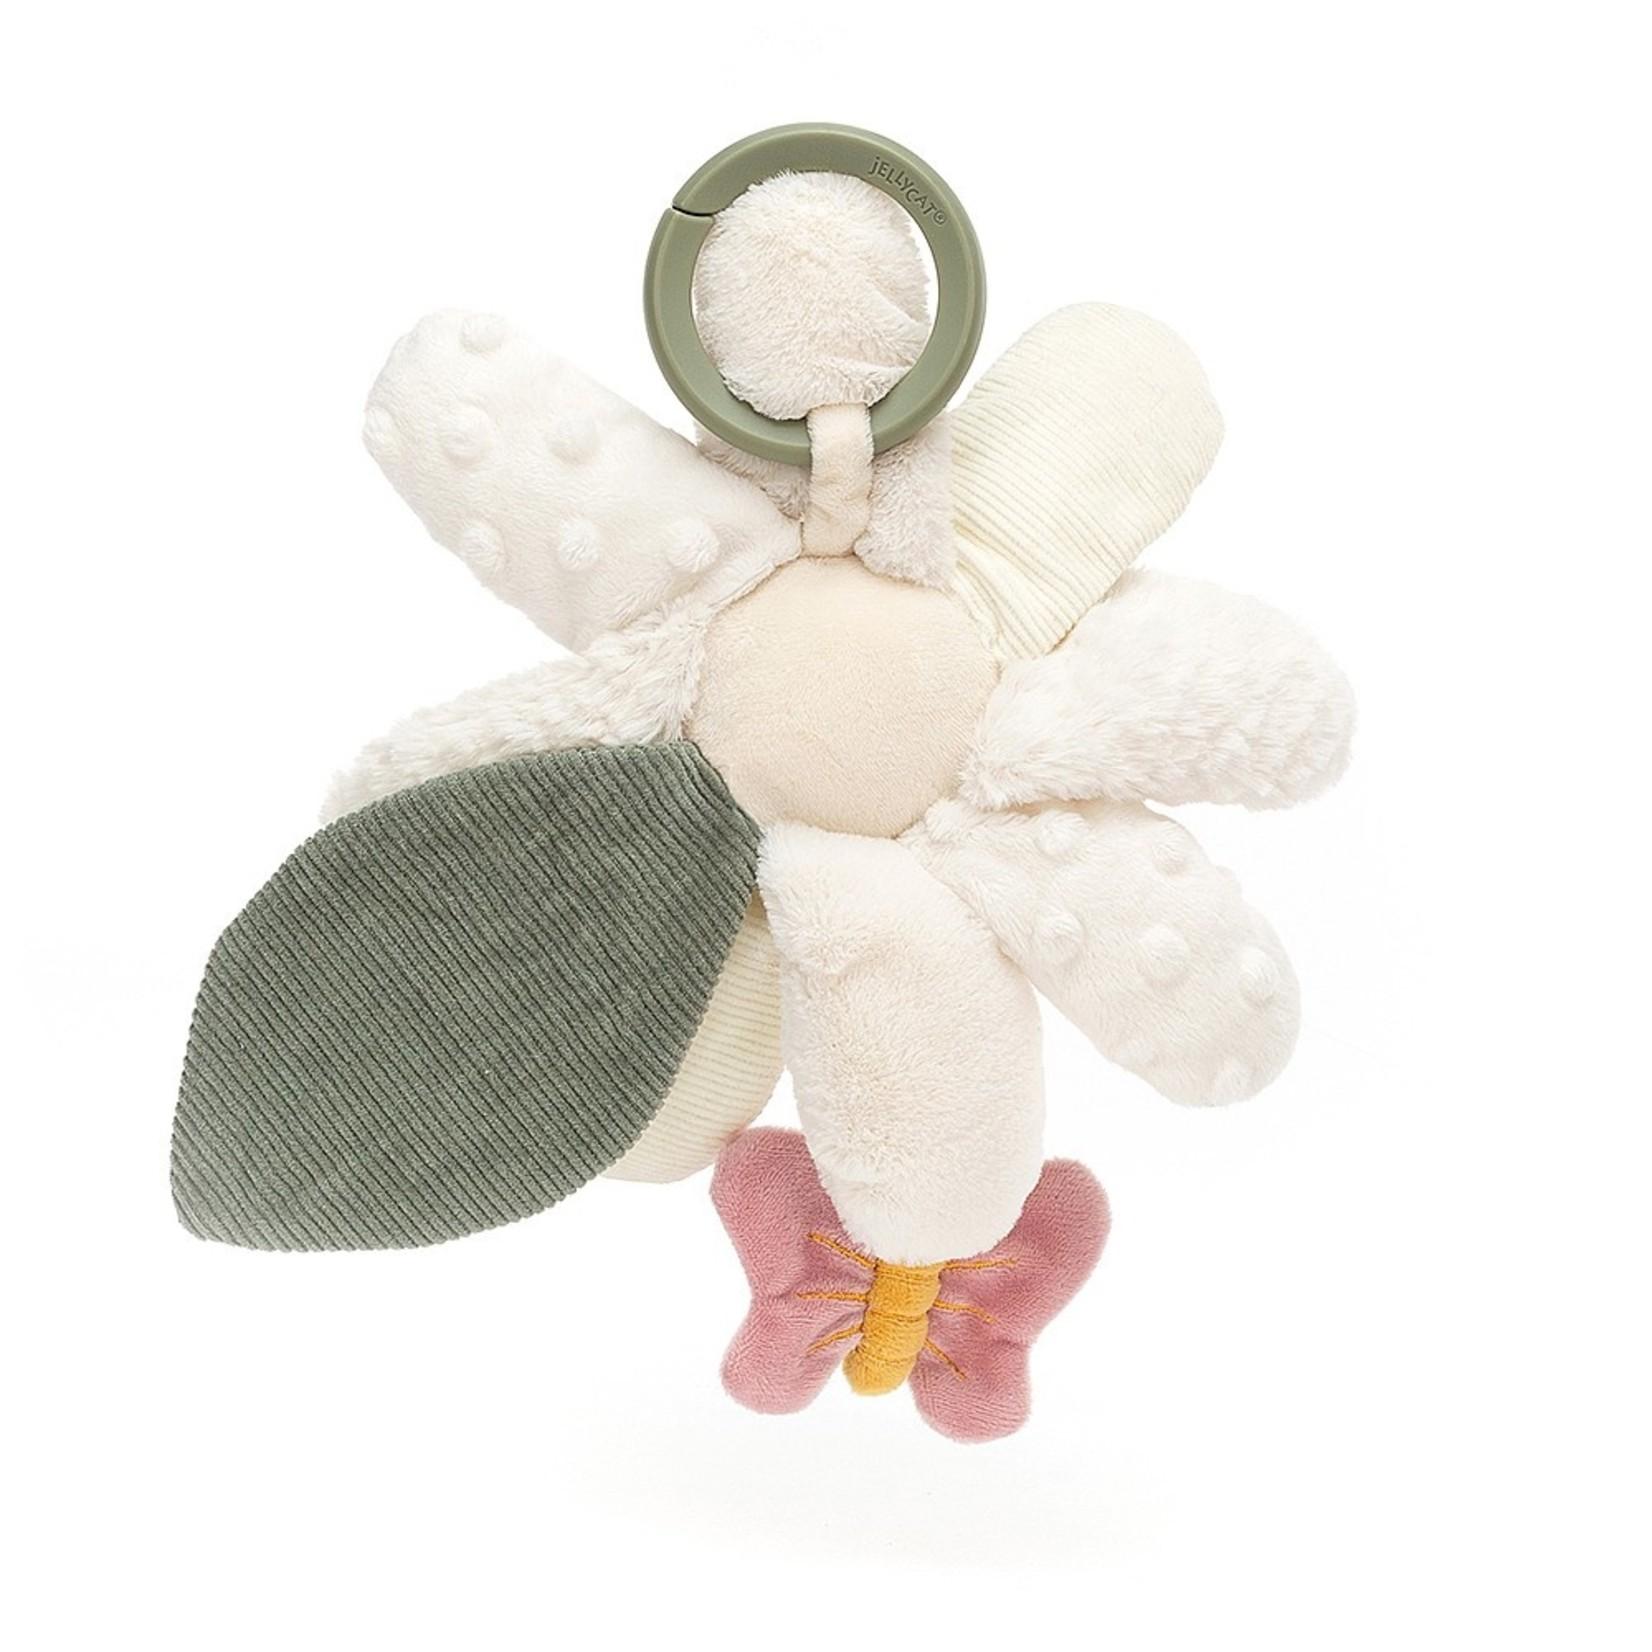 Jellycat Jellycat Fleury Daisy Activity Toy 20x20cm